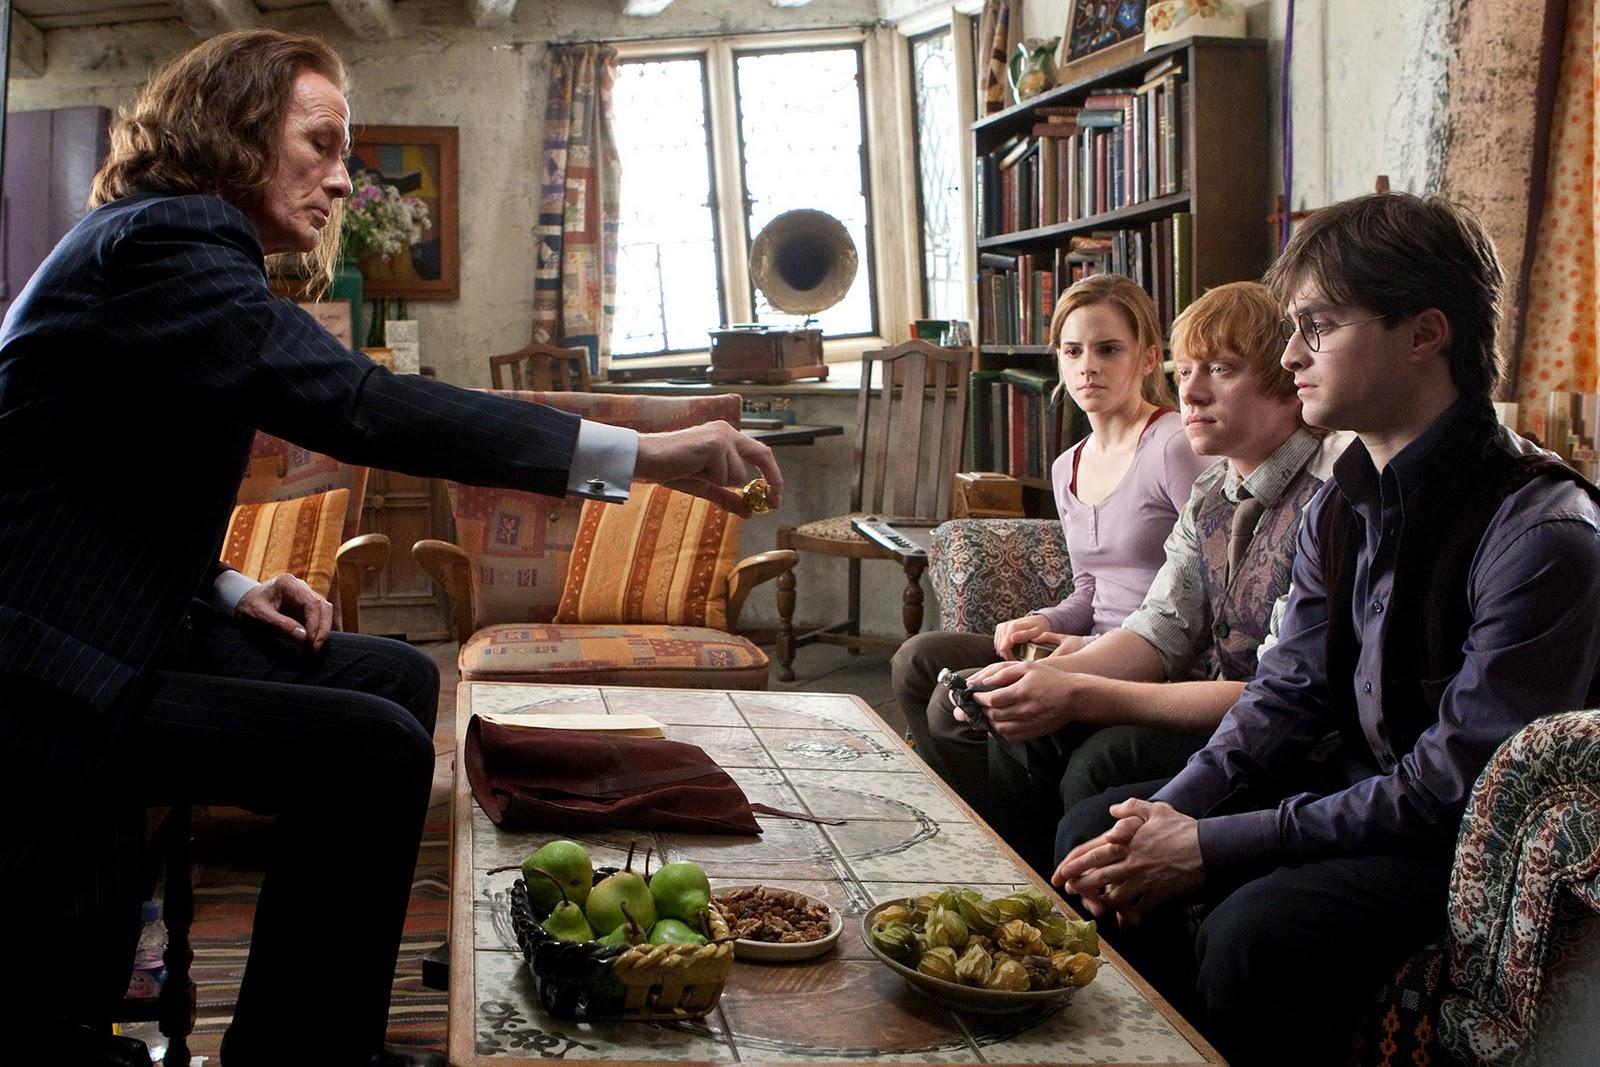 http://2.bp.blogspot.com/_g9FcMPVi7bk/TPZHc14Cb2I/AAAAAAAABNc/dVJh8VMka7g/s1600/Rupert-Grint-as-Ron-Weasley-Bill-Nighy-as-Rufus-Scrimgeour-Daniel-Radcliffe-and-Emma-Watson-as-Hermione-Granger-in-Harry-Potter-and-the-Deathly-Hallows-Part-I.jpg